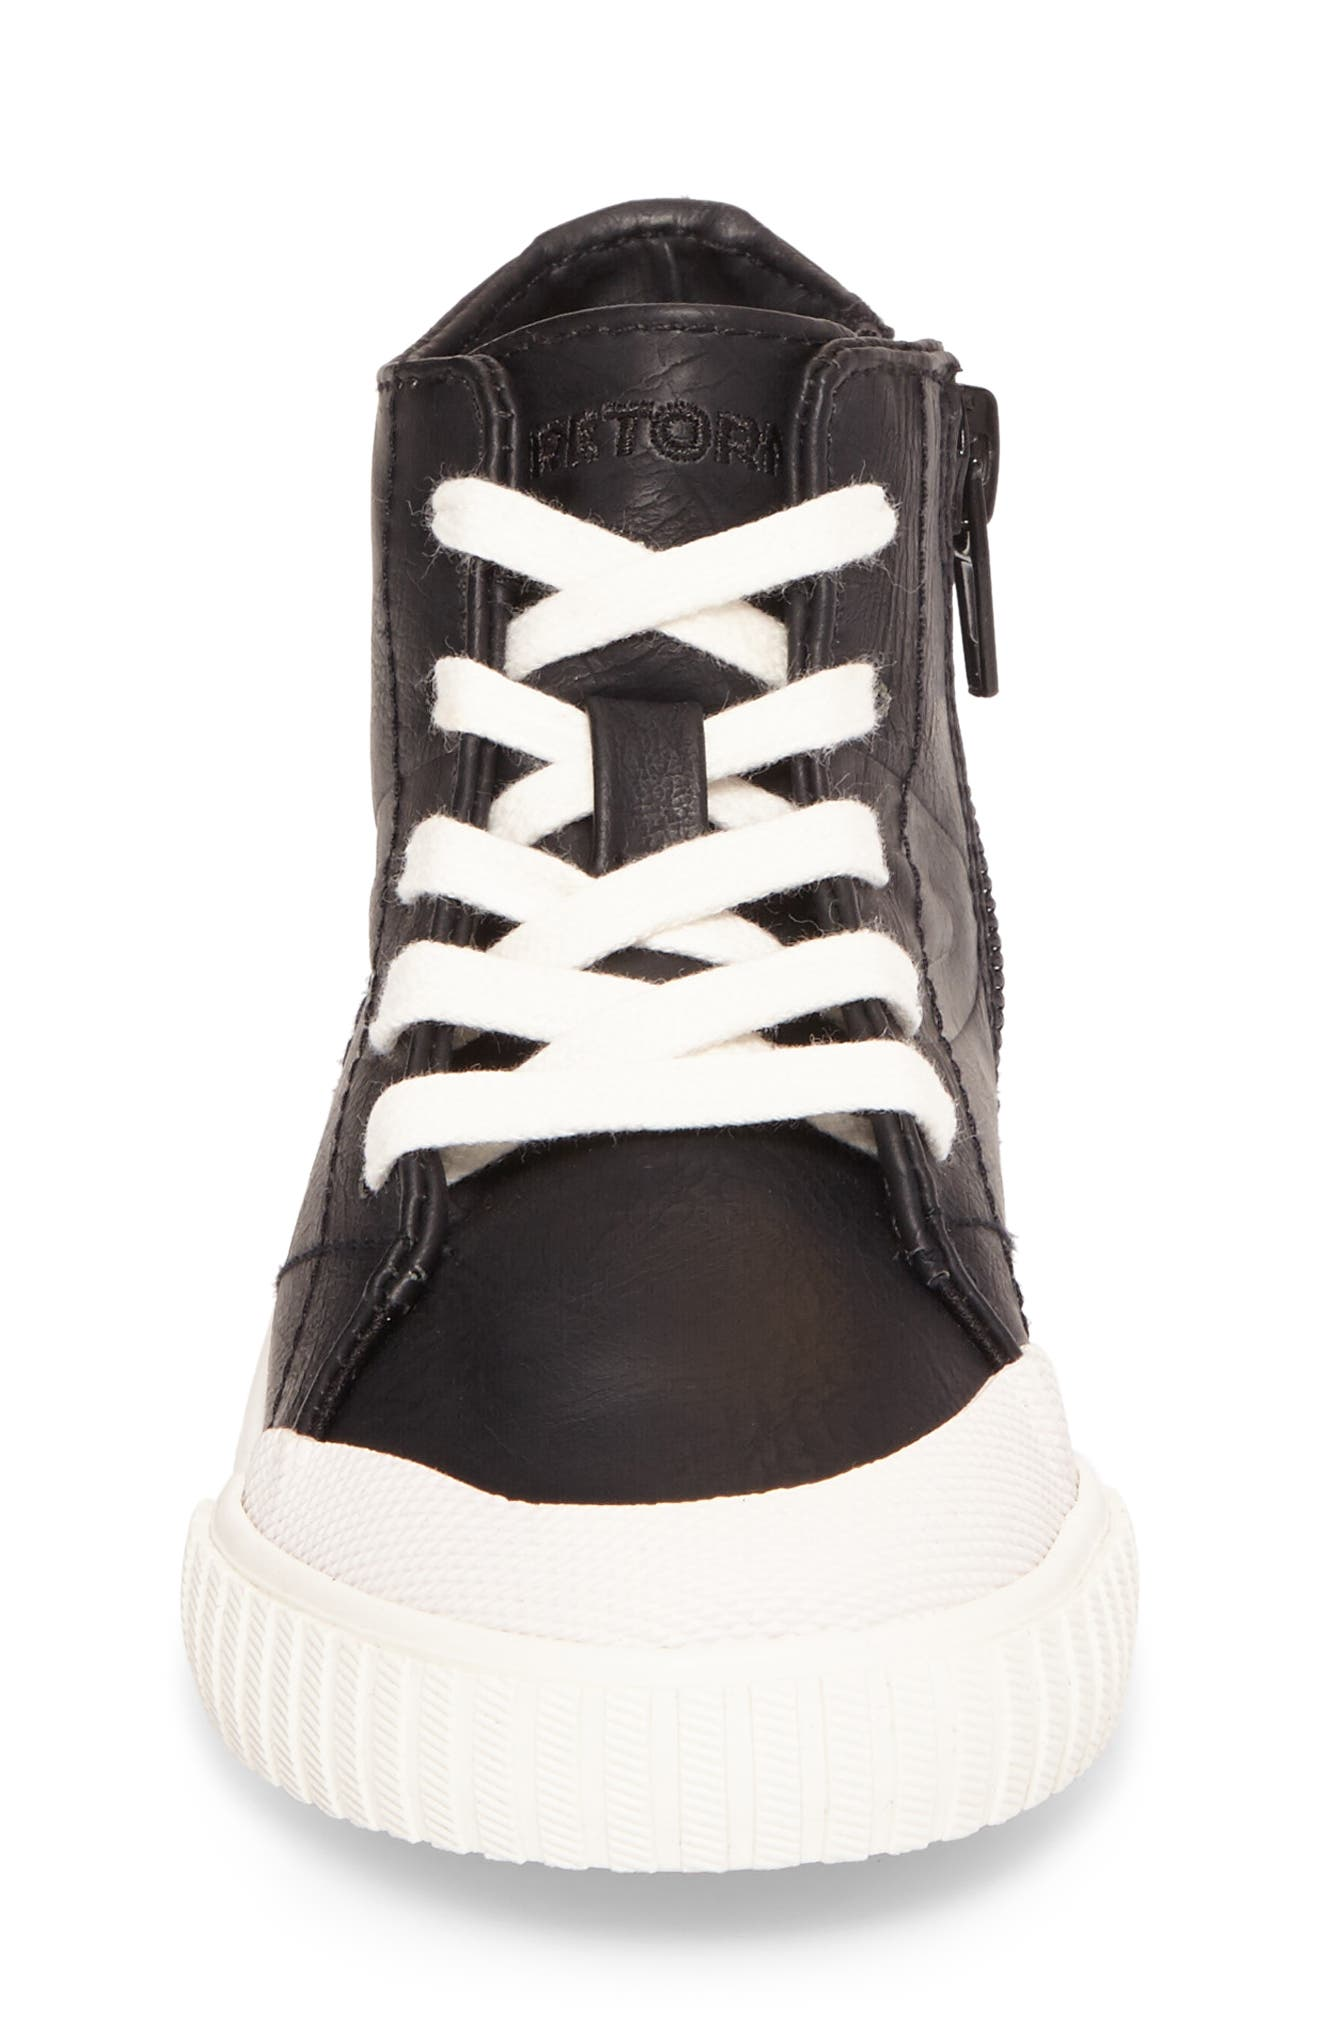 Marley High Top Sneaker,                             Alternate thumbnail 10, color,